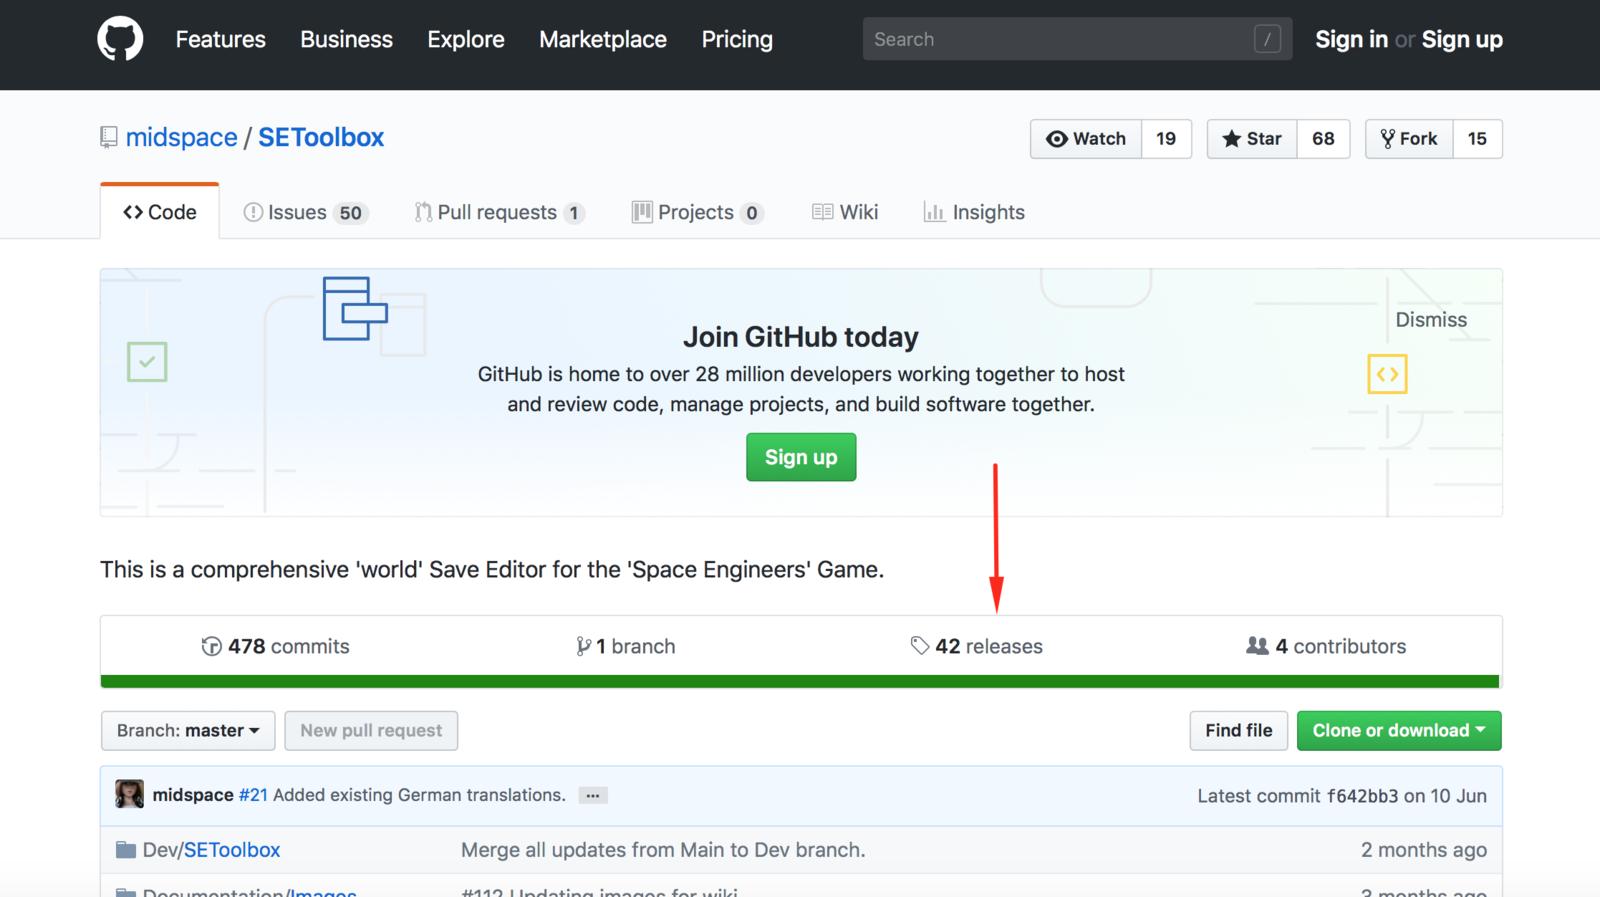 SE Toolbox on GitHub